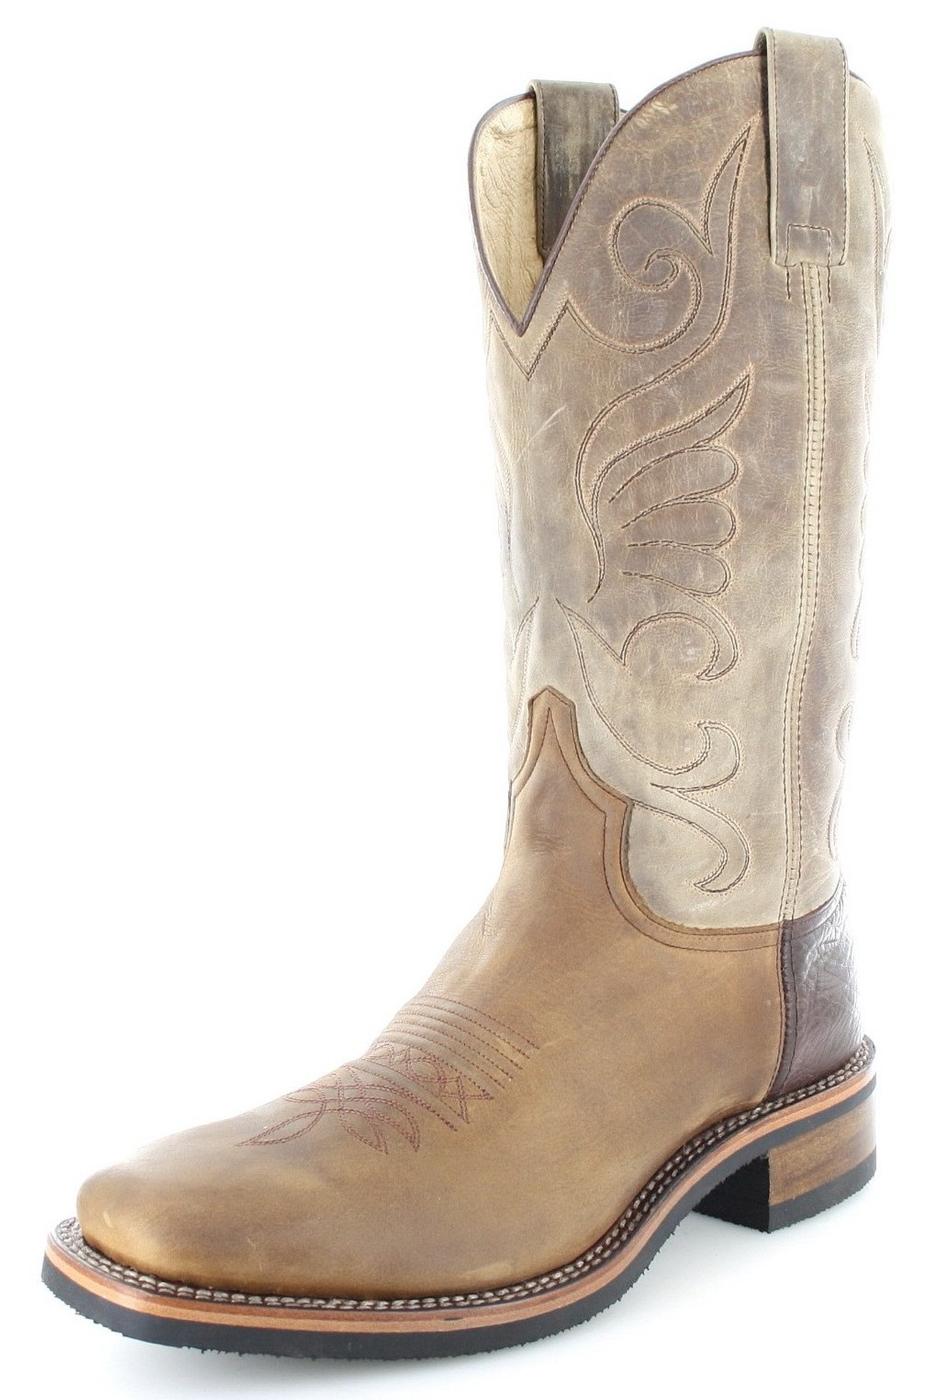 Sendra Boots 11599 Tang Westernreitstiefel - braun